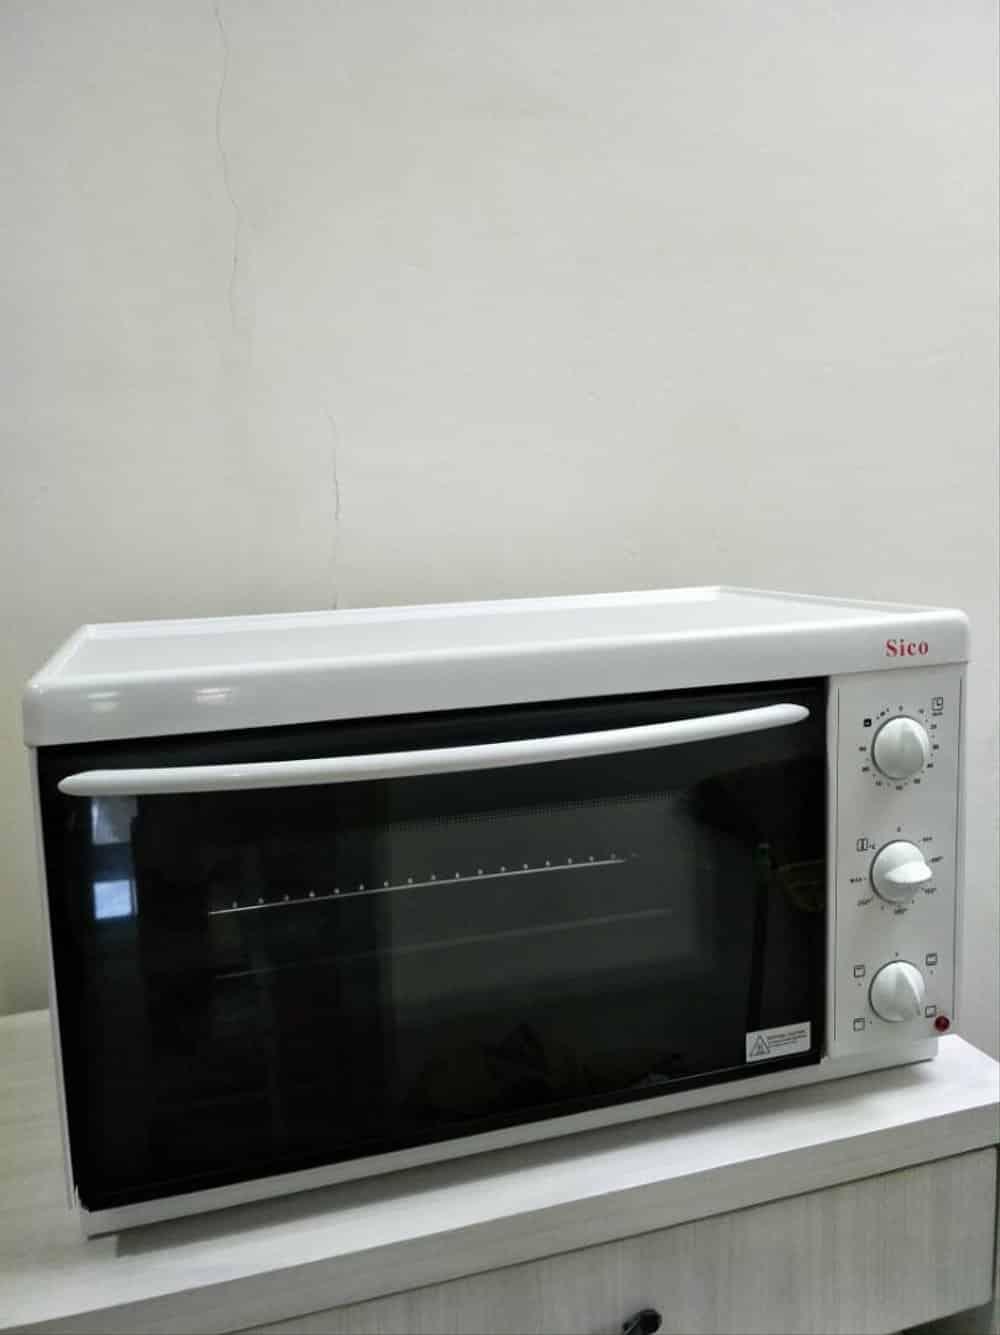 Sico-Big-Oven-TK-1150